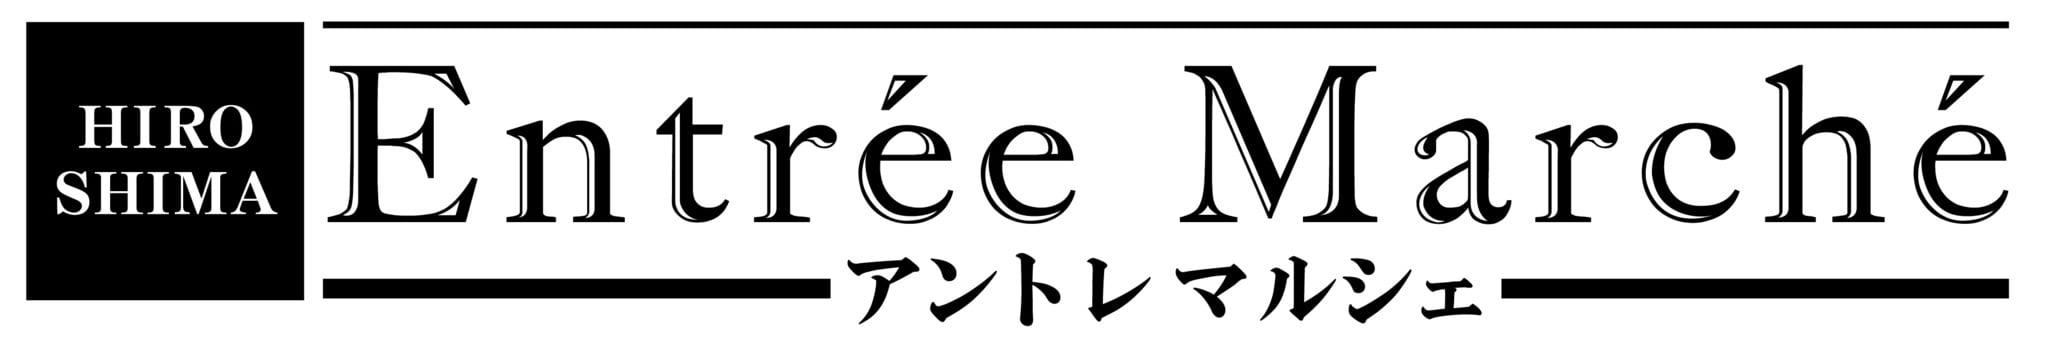 https://www.sn-hiroshima.co.jp/files/libs/468/201712251511555573.jpg